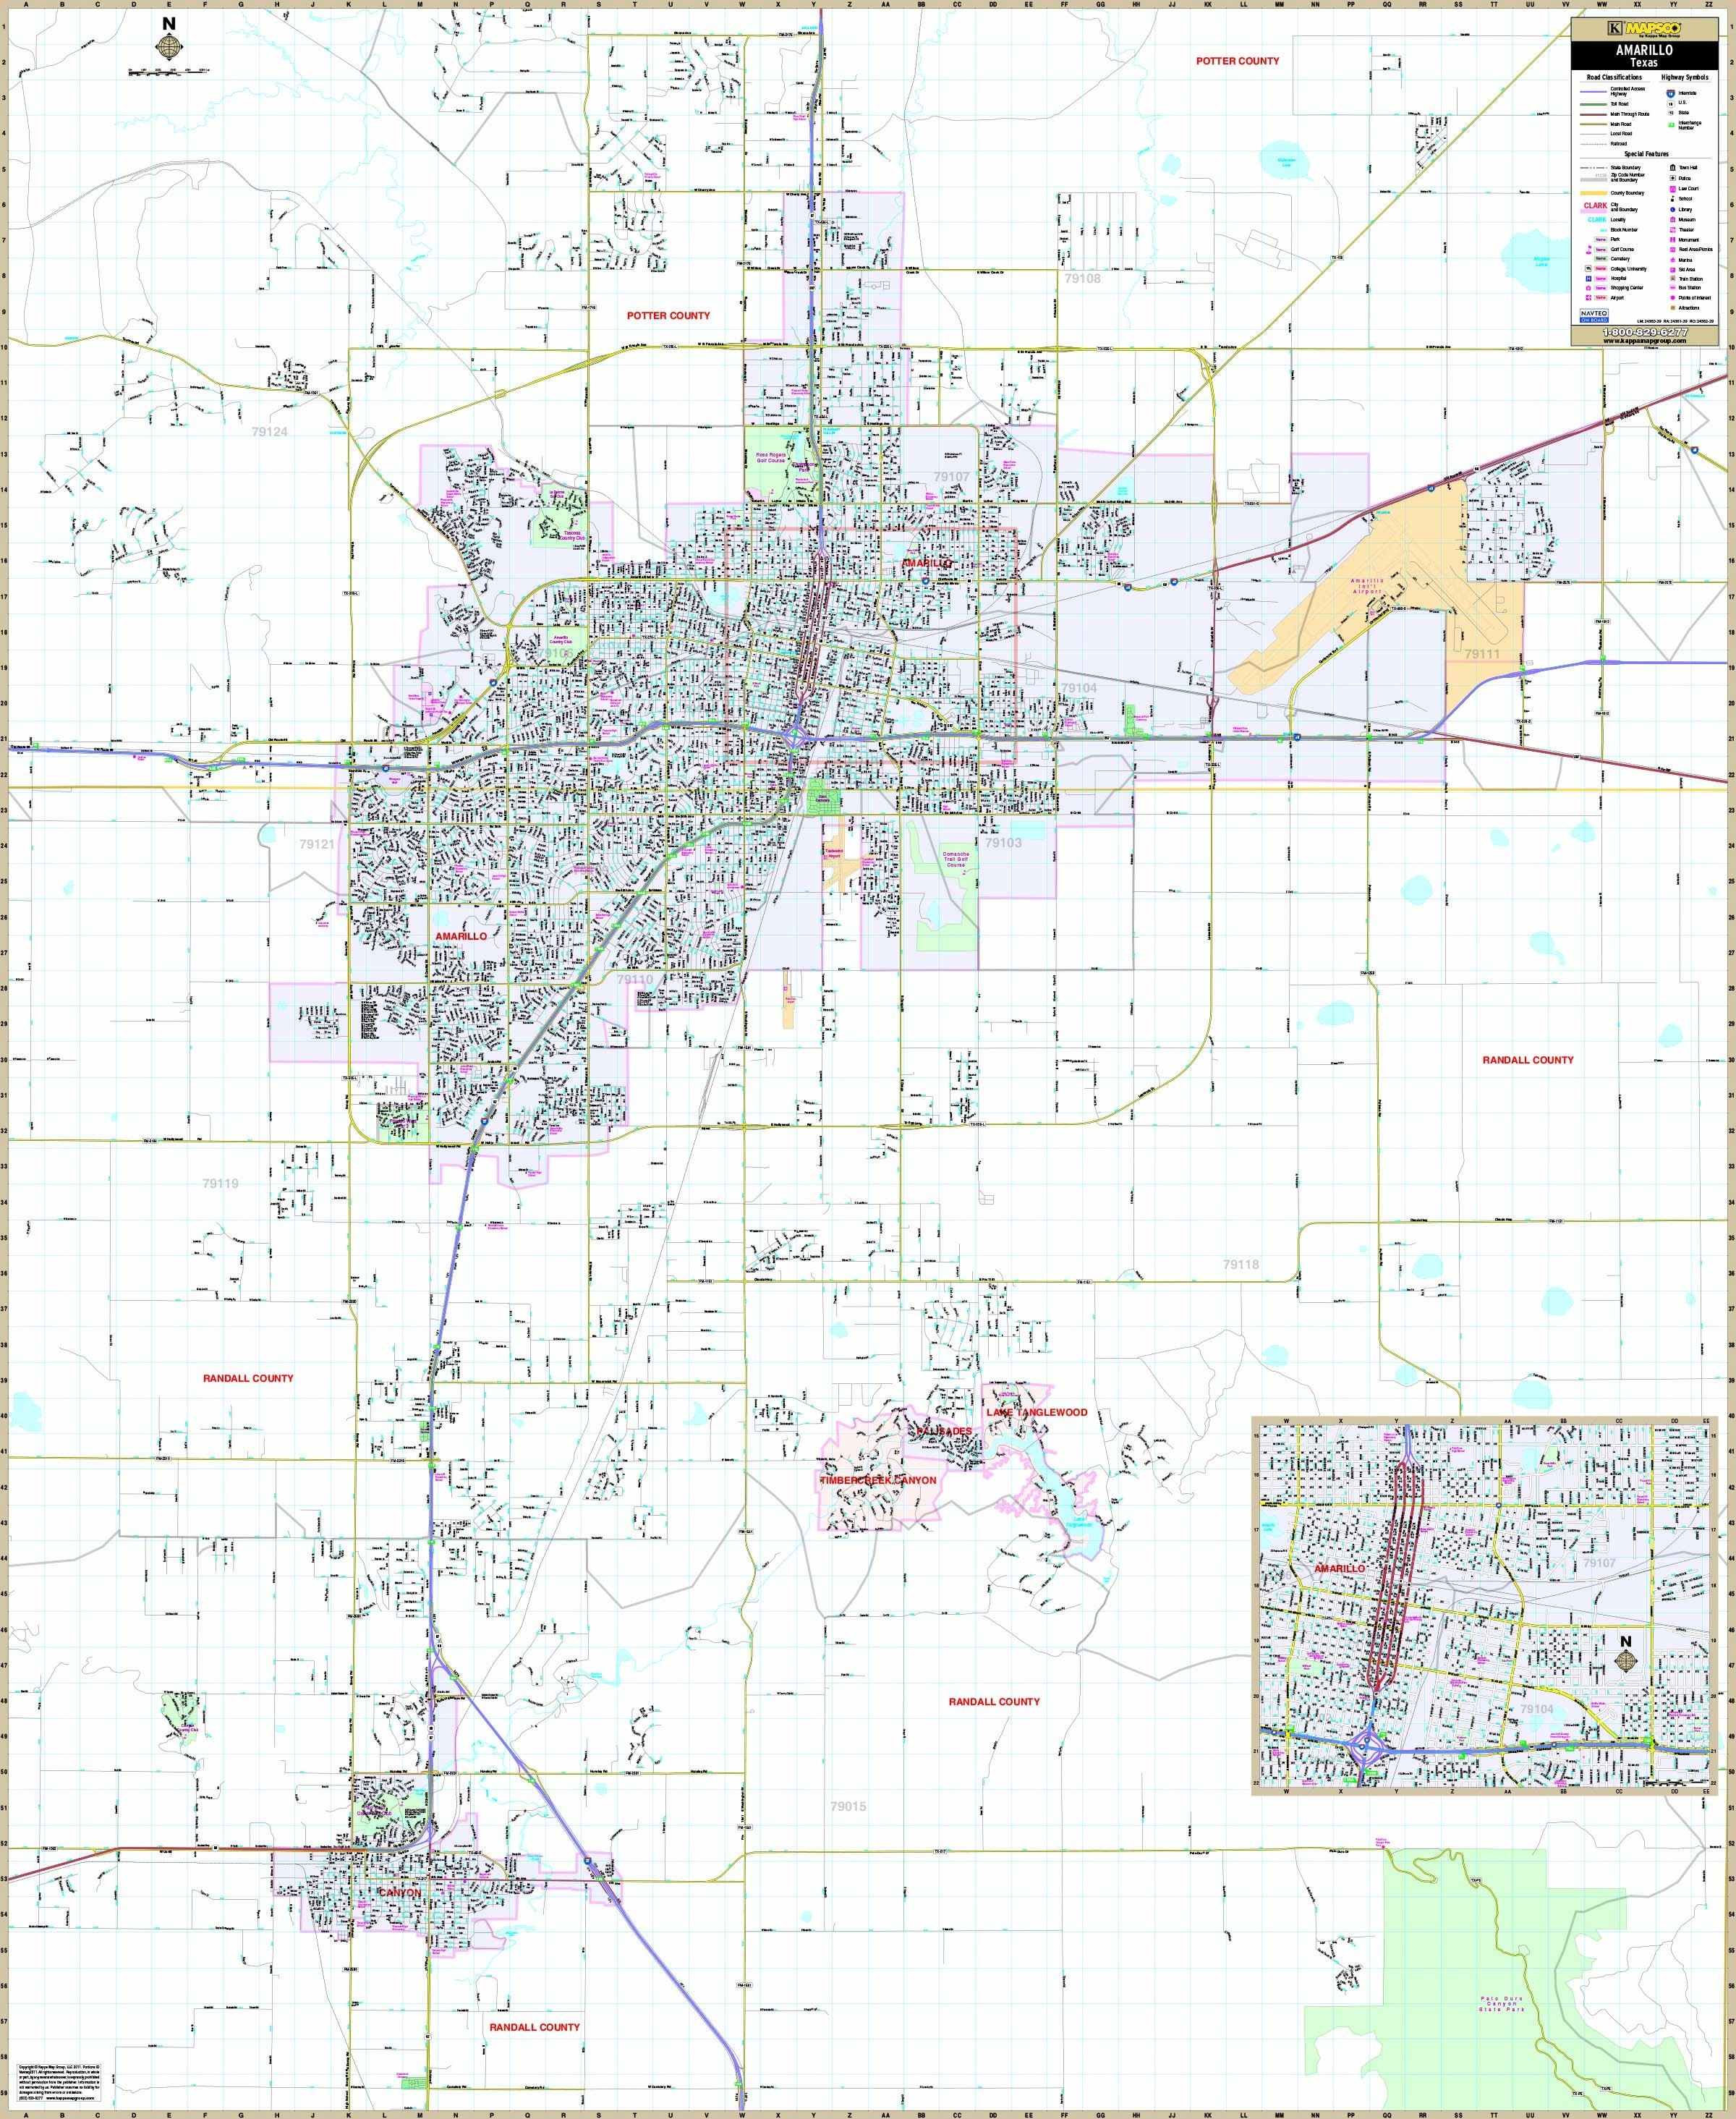 Amarillo Metro Map1 13 Amarillo Tx Map | Ageorgio - Printable Map Of Amarillo Tx